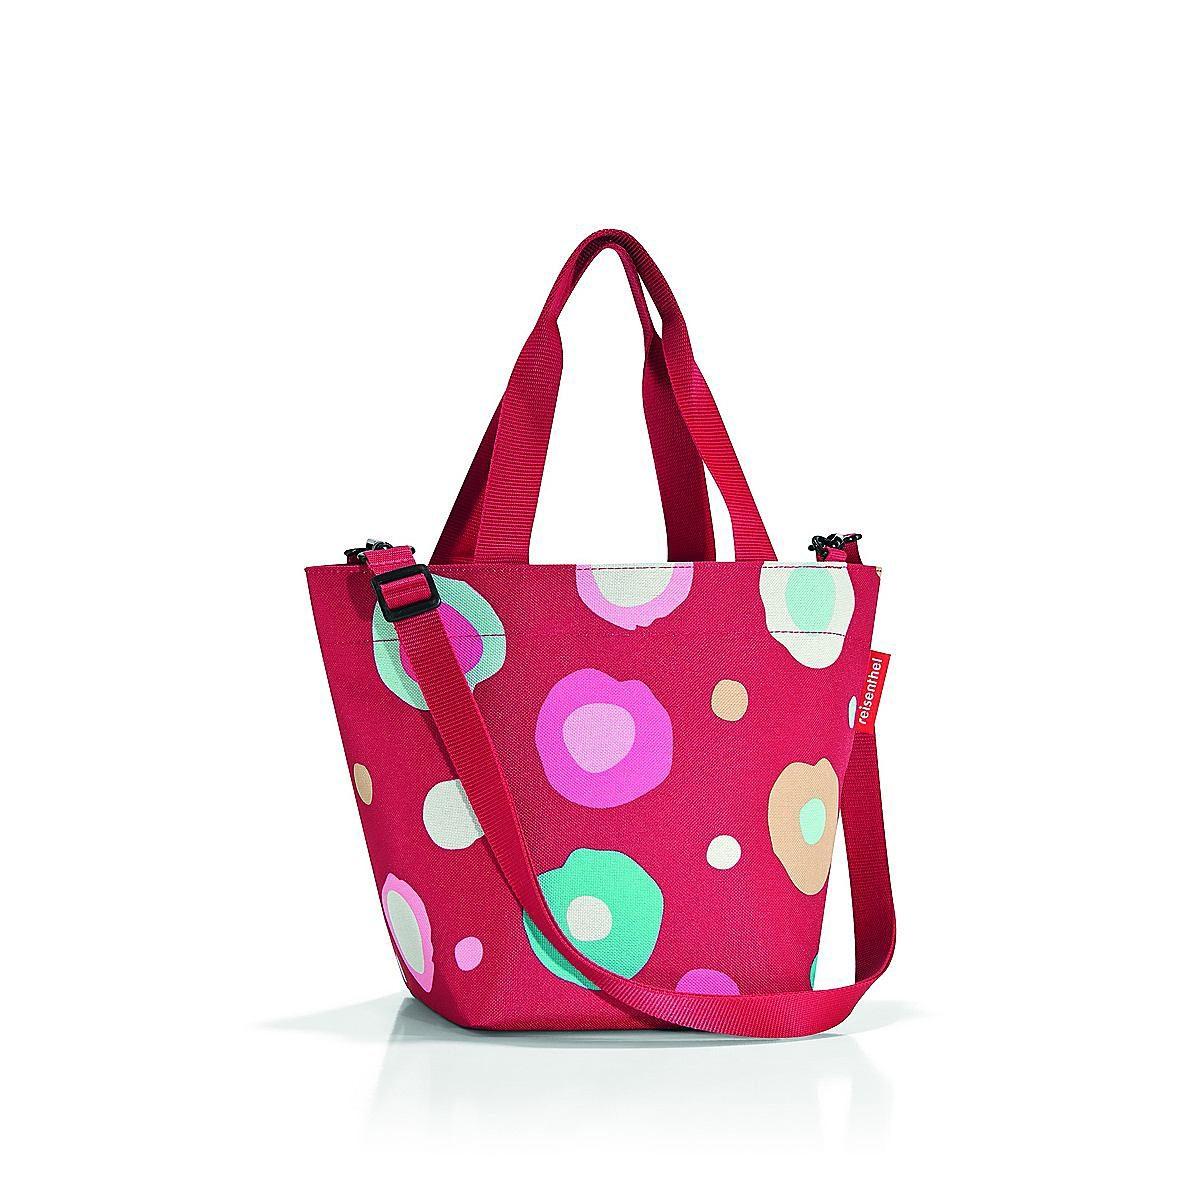 REISENTHEL® Shopper XS funky dots 2